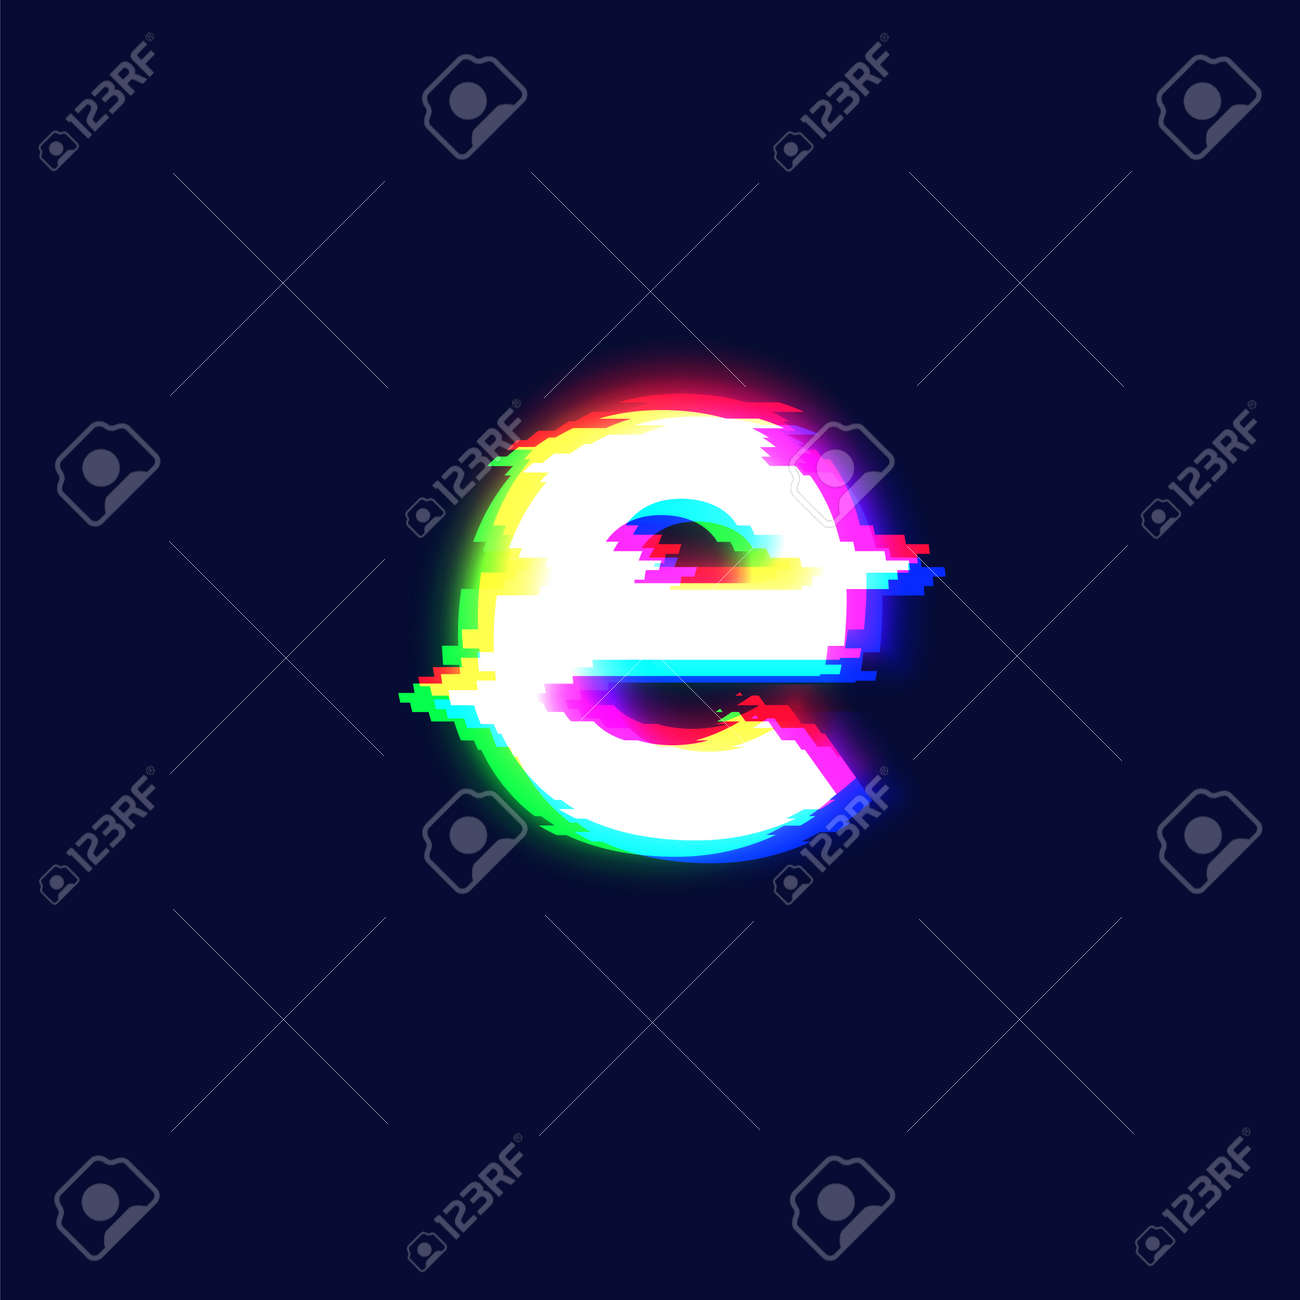 Realistic glitch font character 'e', vector illustration - 152114837